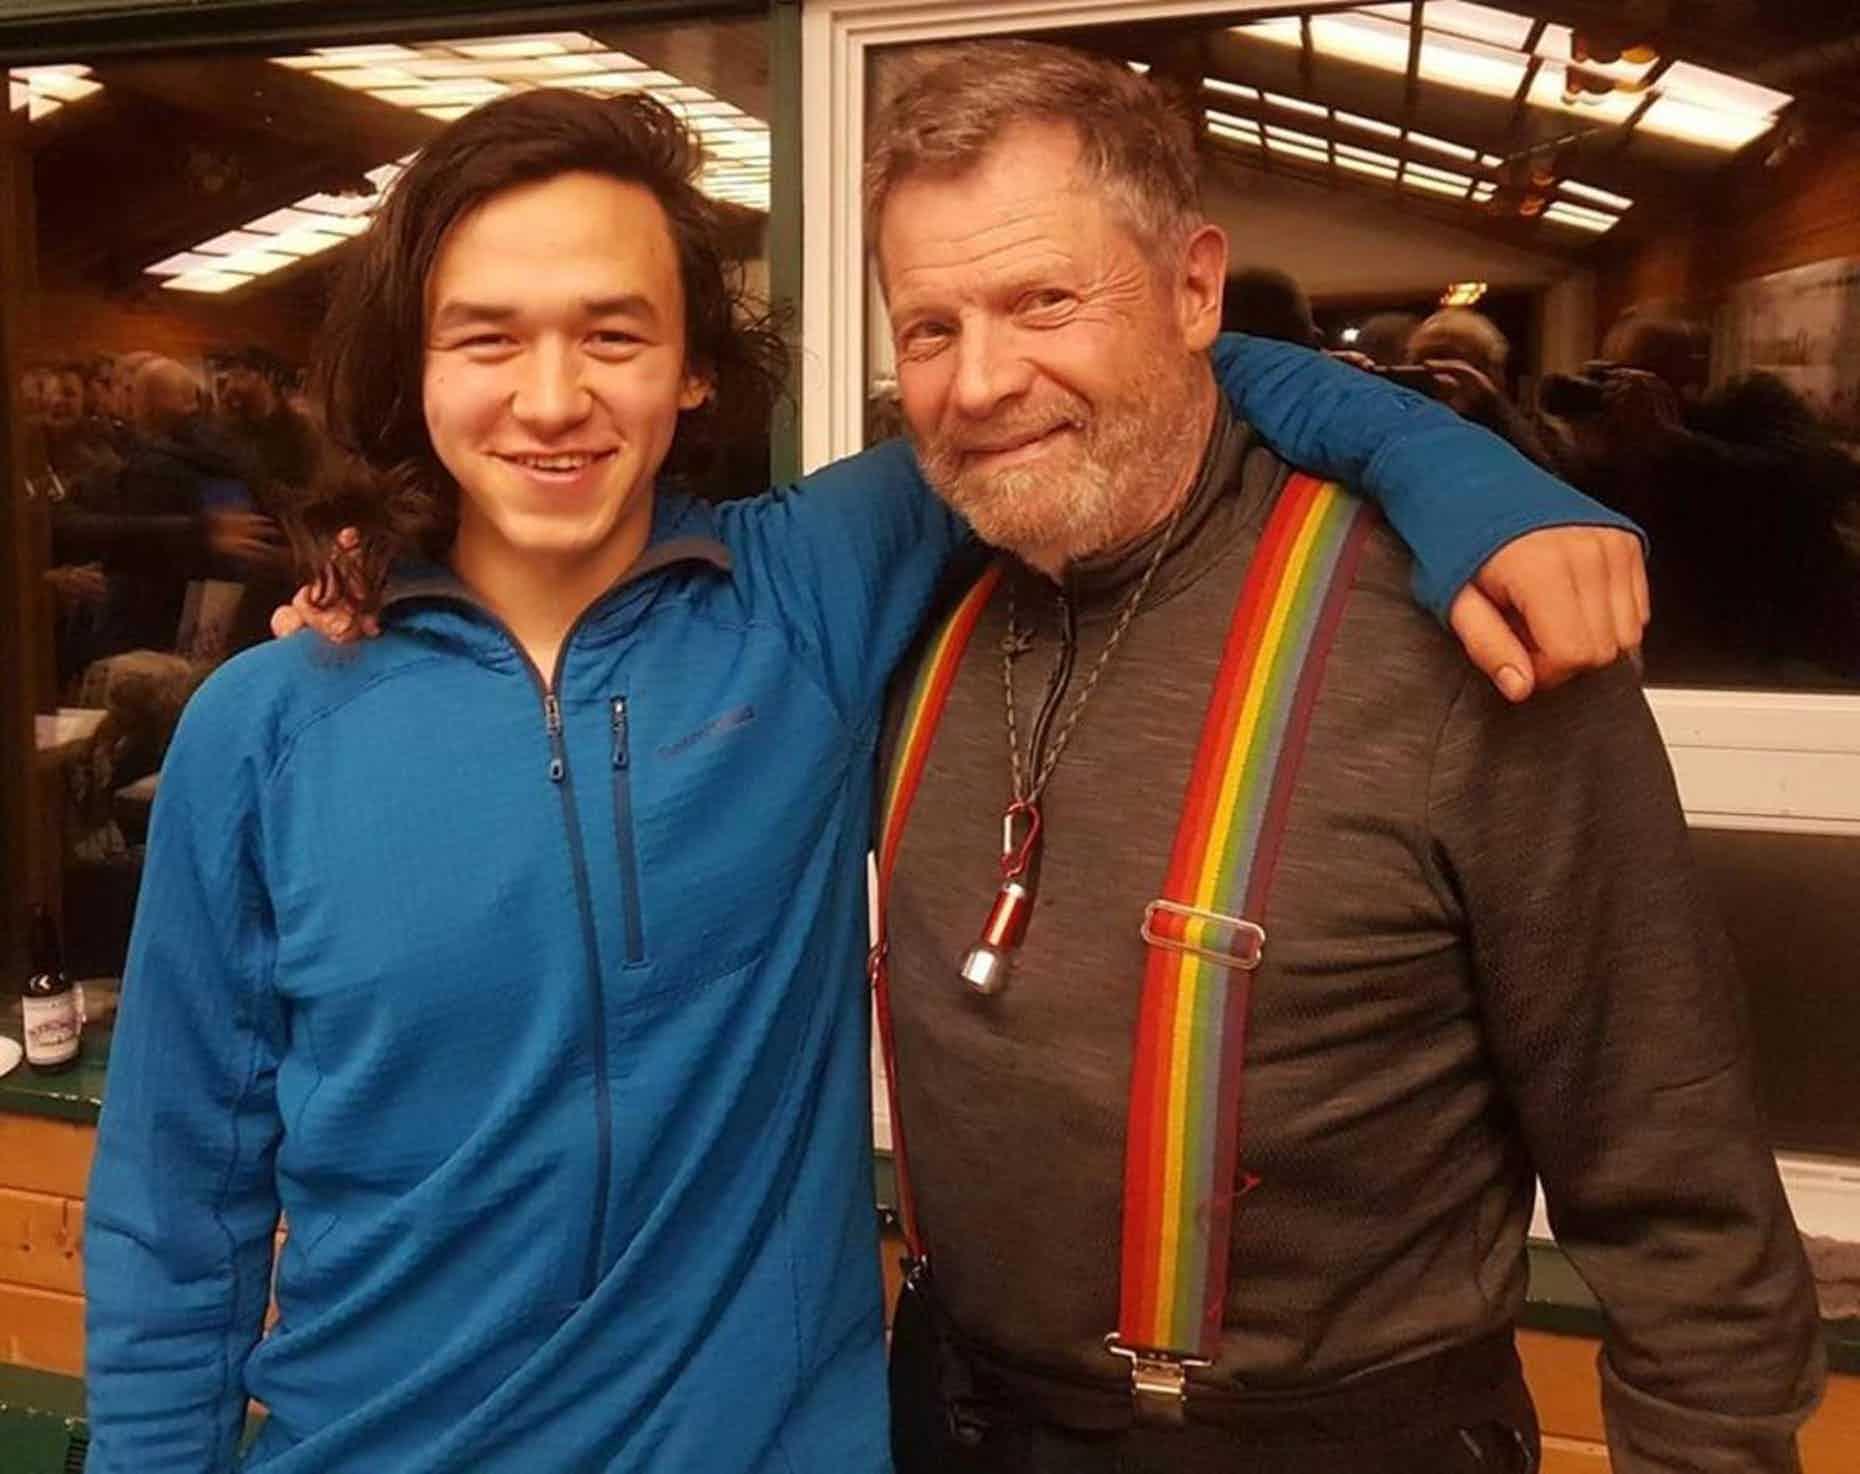 Martin Apayauq Reitan, 21, and Jim Lanier, 78, at a Yukon Quest pre-race mushers meeting in Whitehorse. (Courtesy of Ketil Reitan)